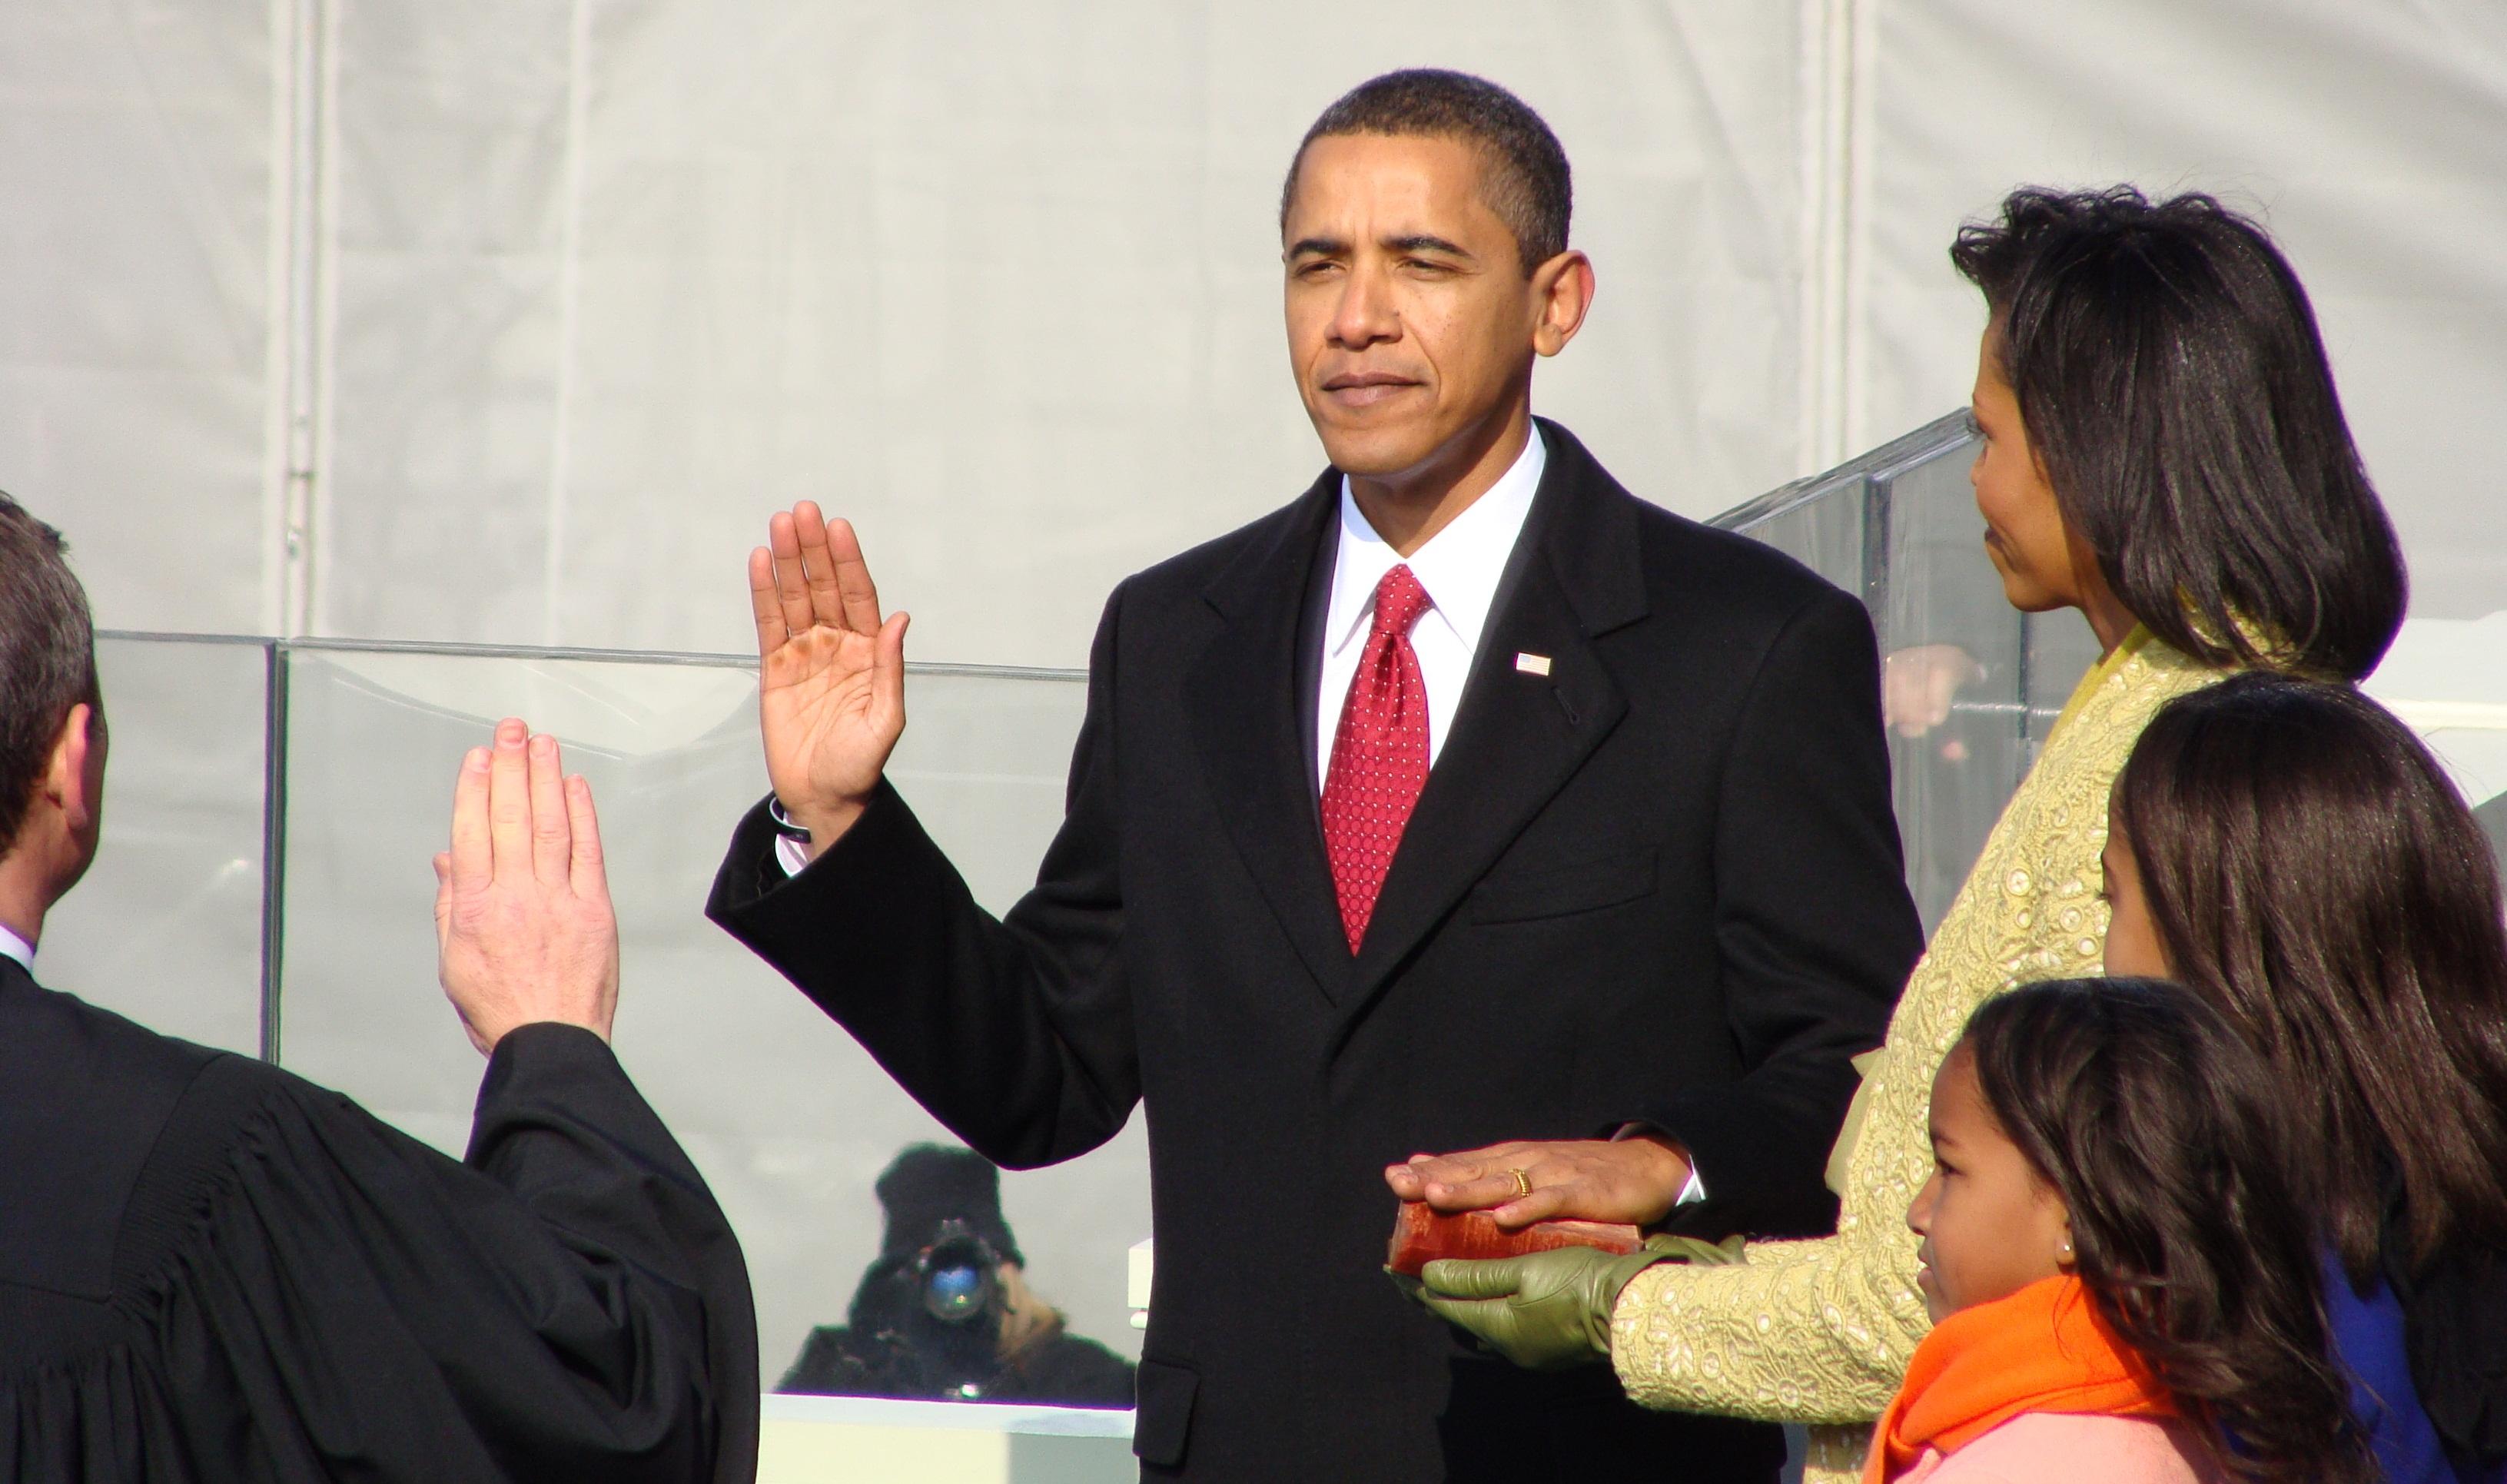 The Manuwchah Prophecy: President Barack Obama? [YAHUWAH